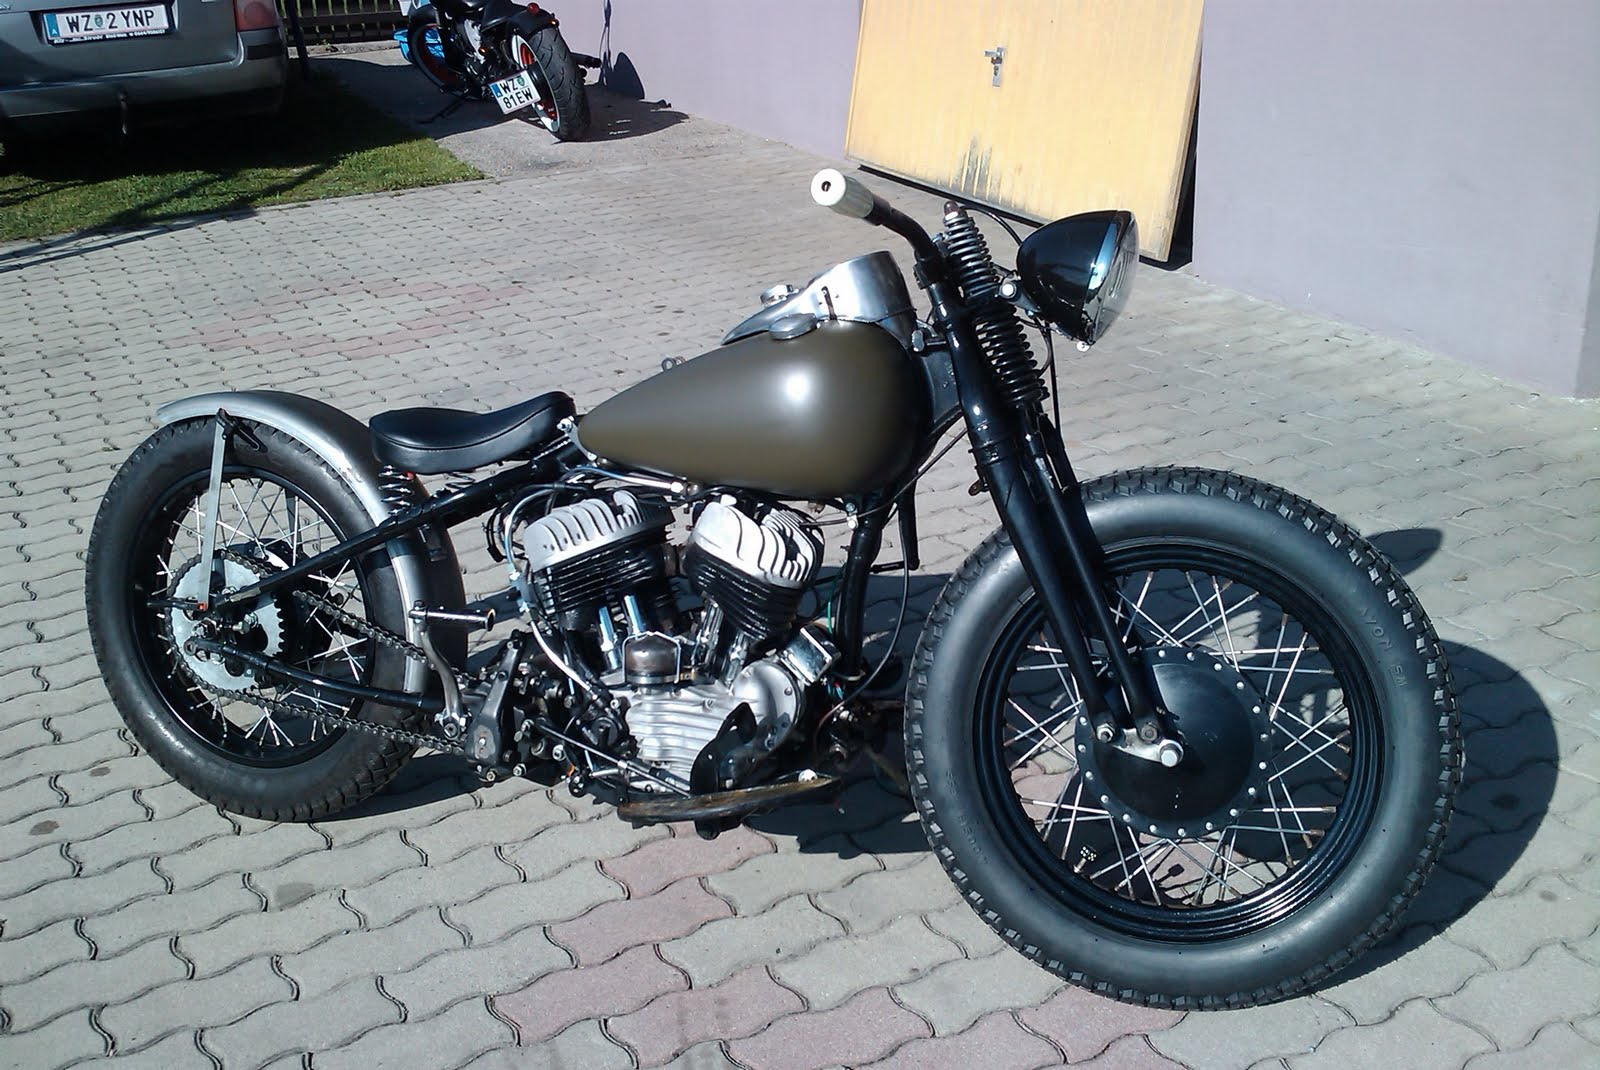 Bobber Cafe Racer Harley Davidson Hd Wallpaper 1080p: Harley Sportster Custom